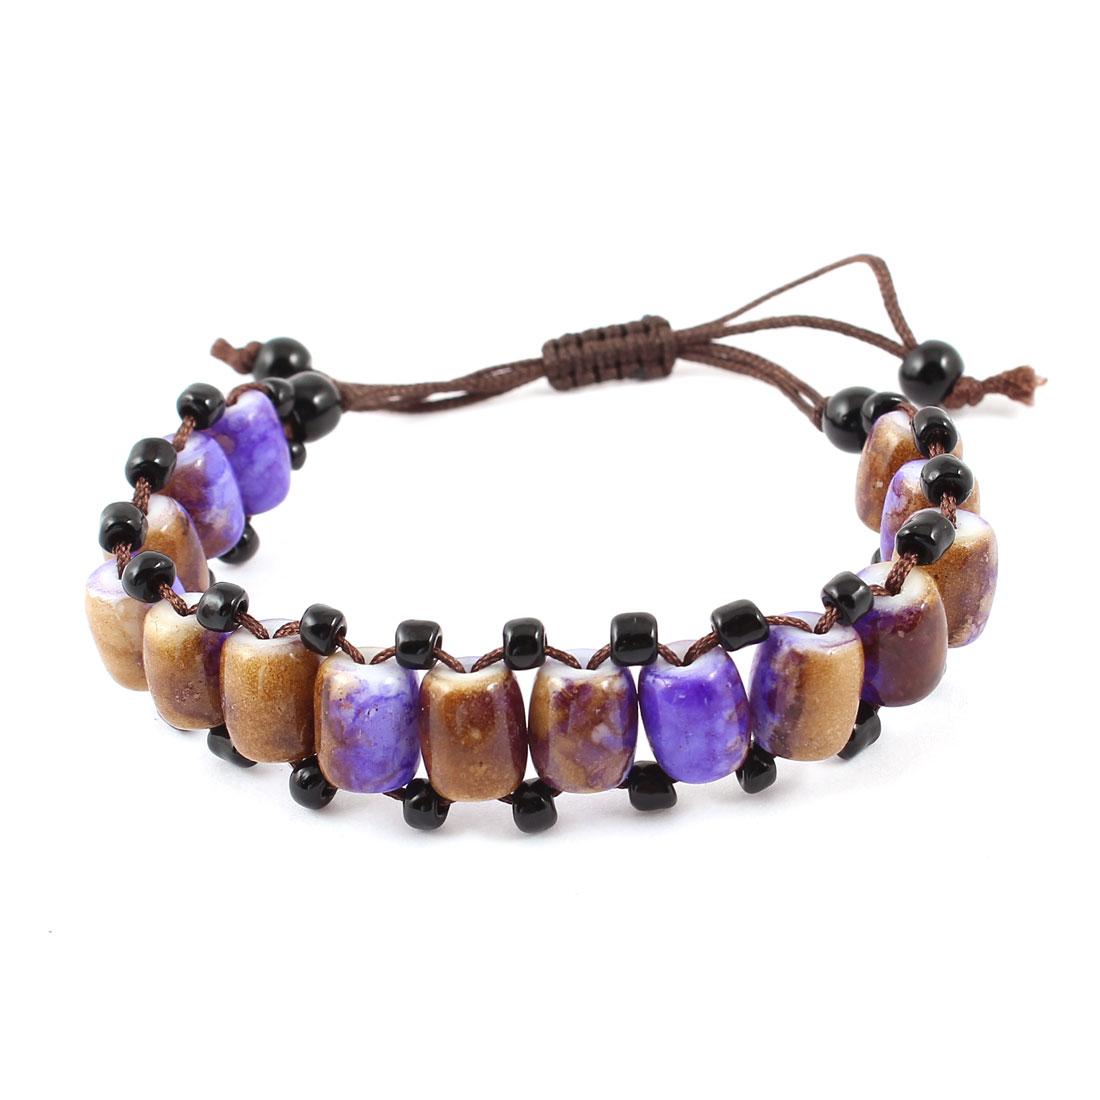 Lady Handmade Nylon Rope Purple Coffee Color Plastic Beads Decor Pull String Wrist Bracelet